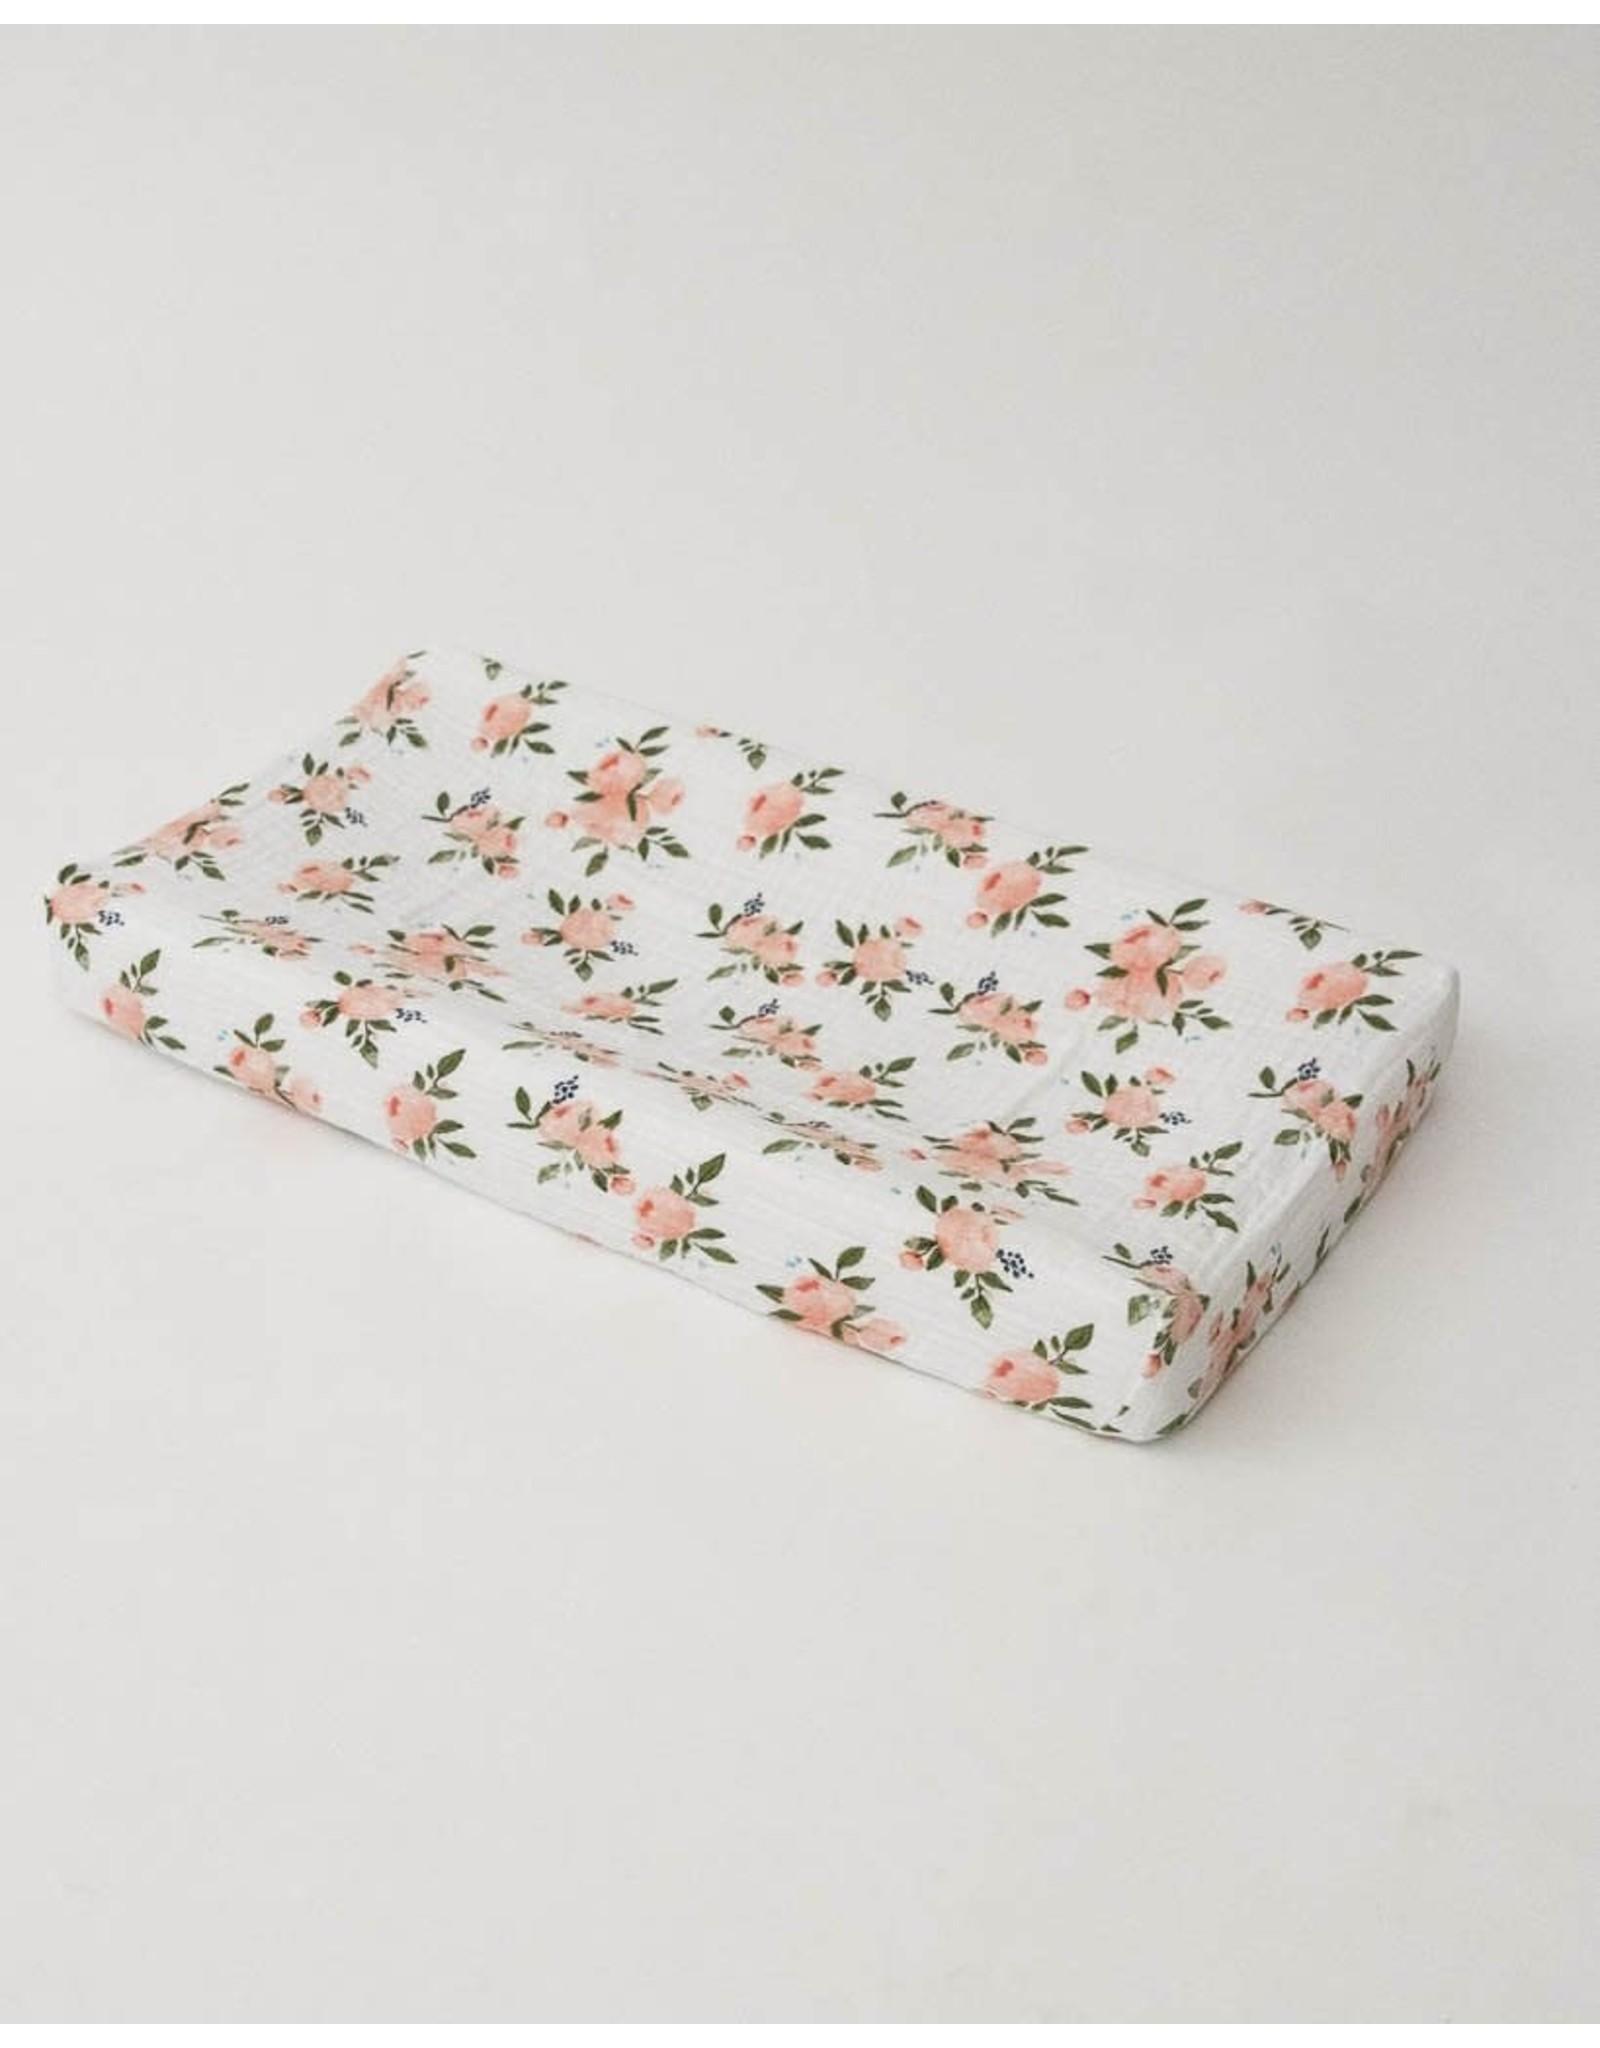 Little Unicorn Little Unicorn Changing pad Cover cotton muslin Aquarel Rozen